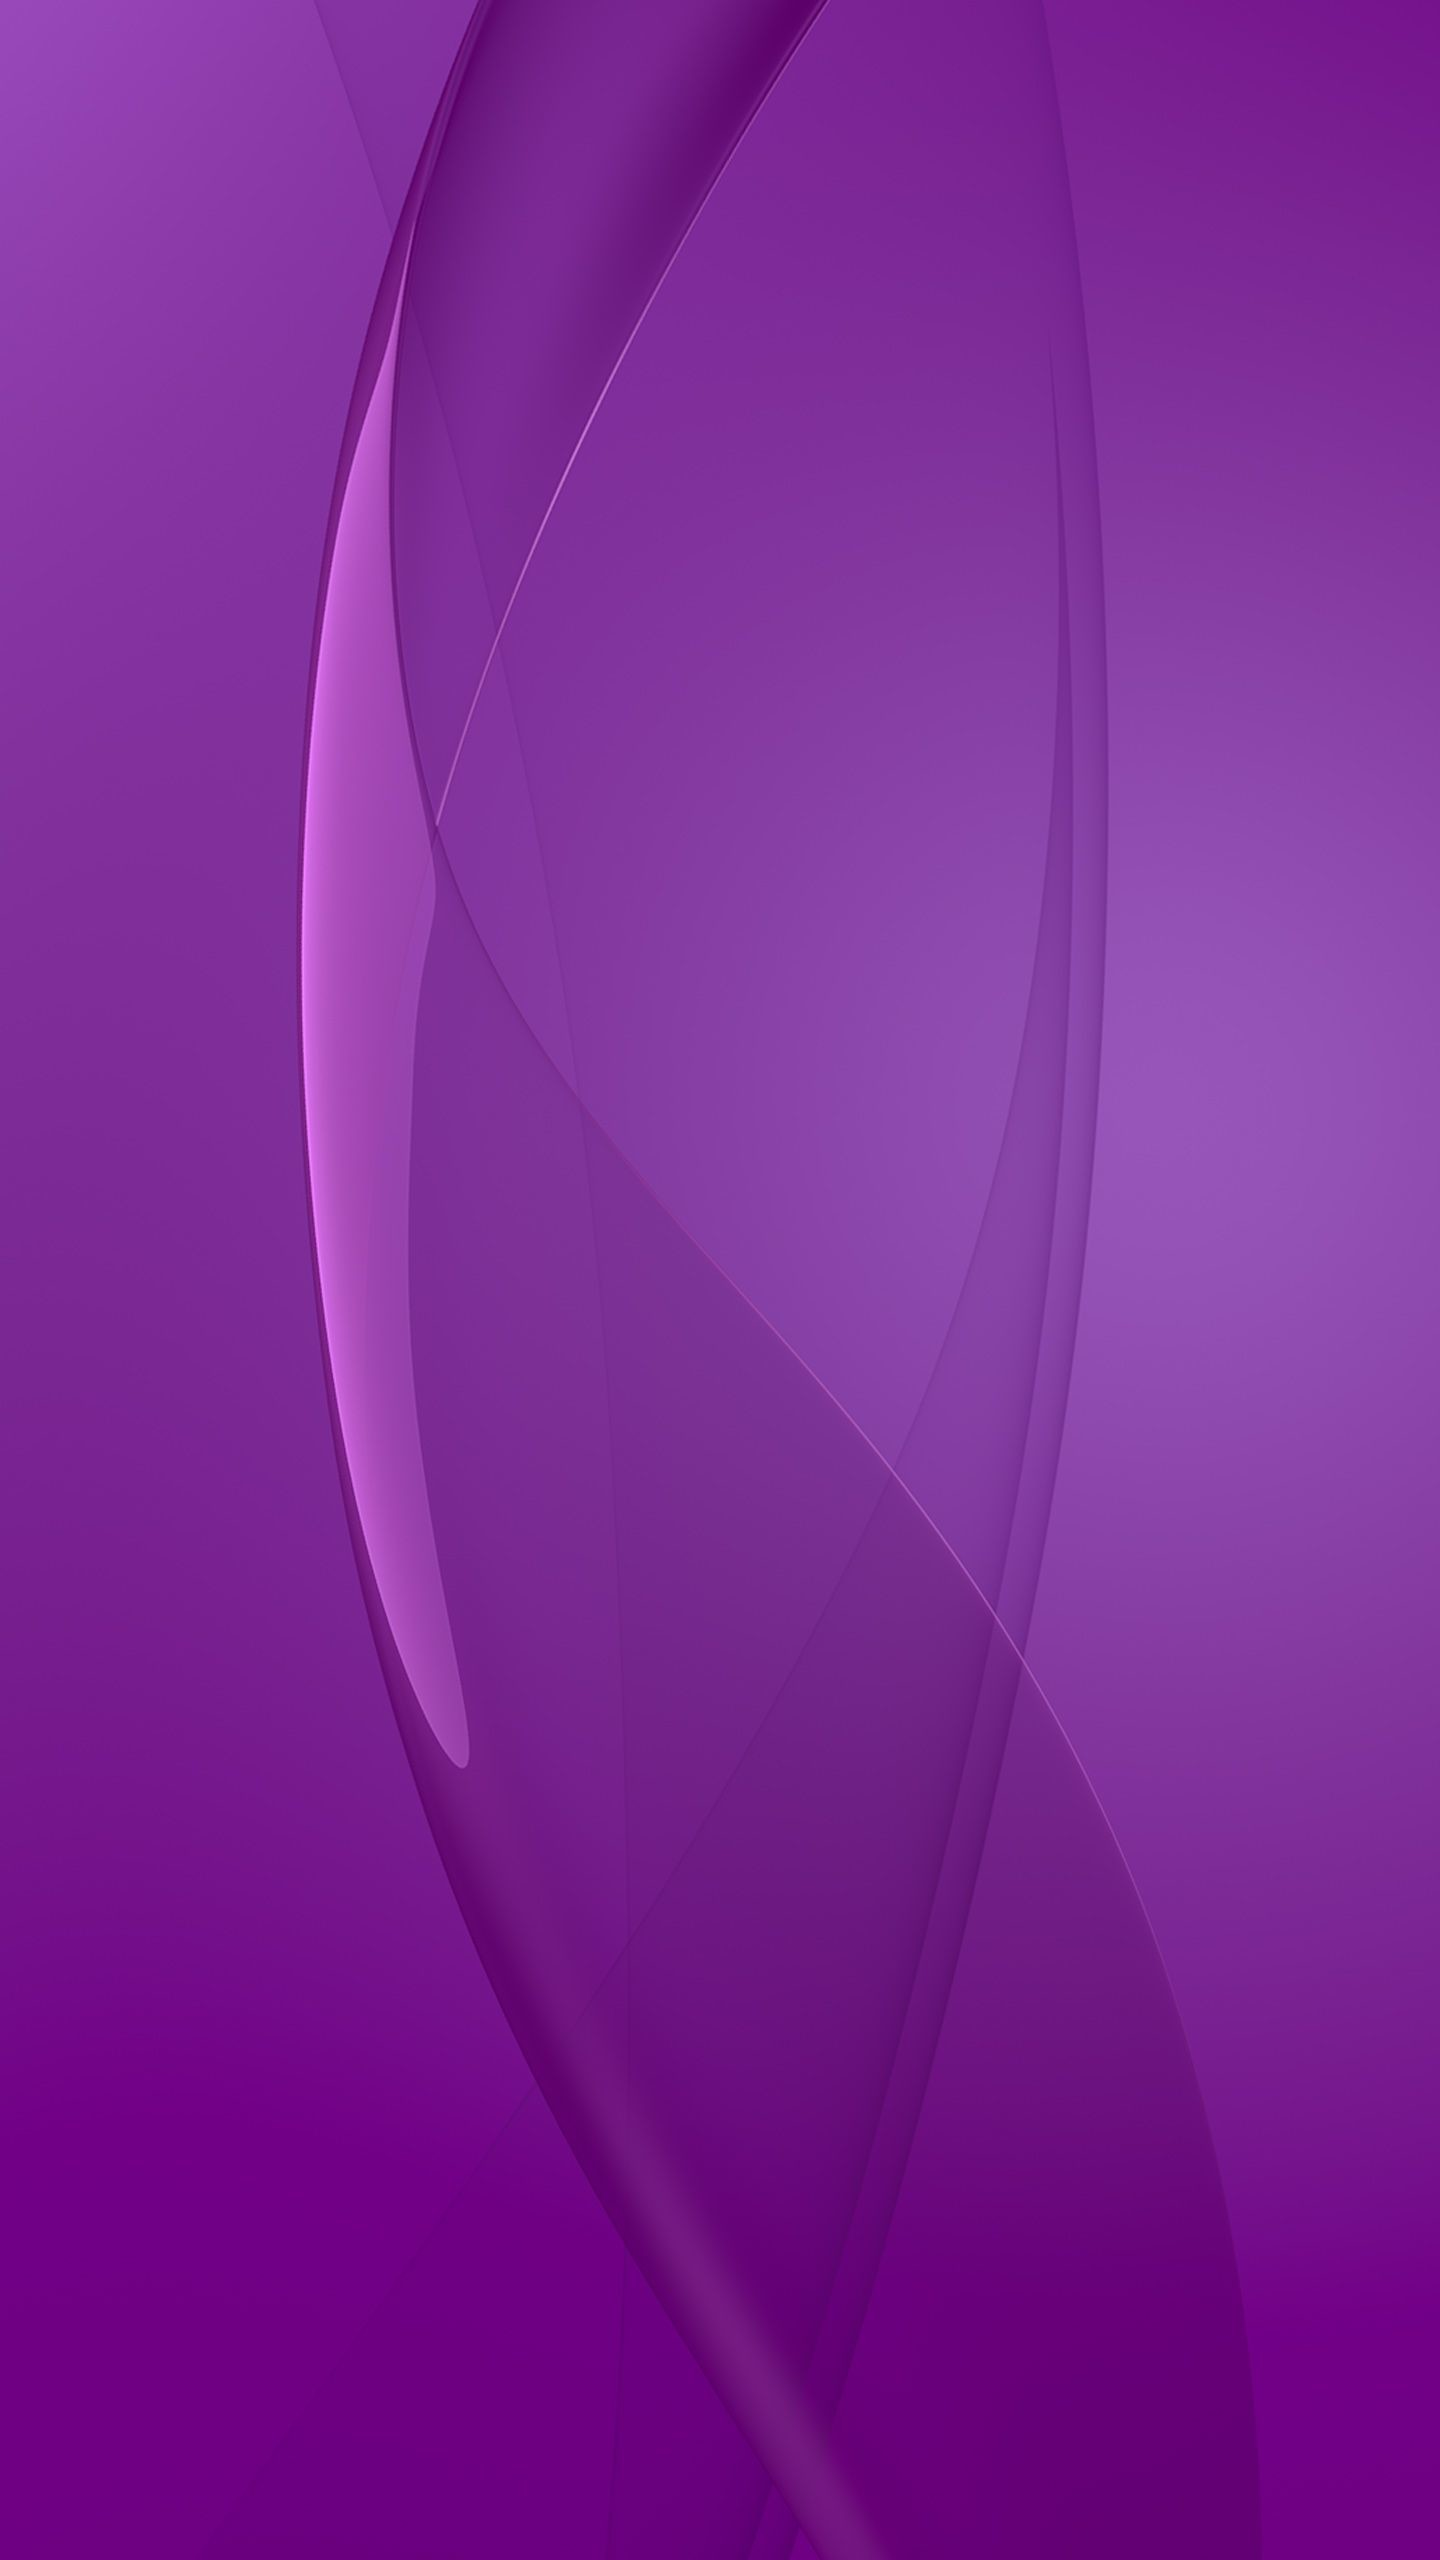 purple phone wallpaper 70 images